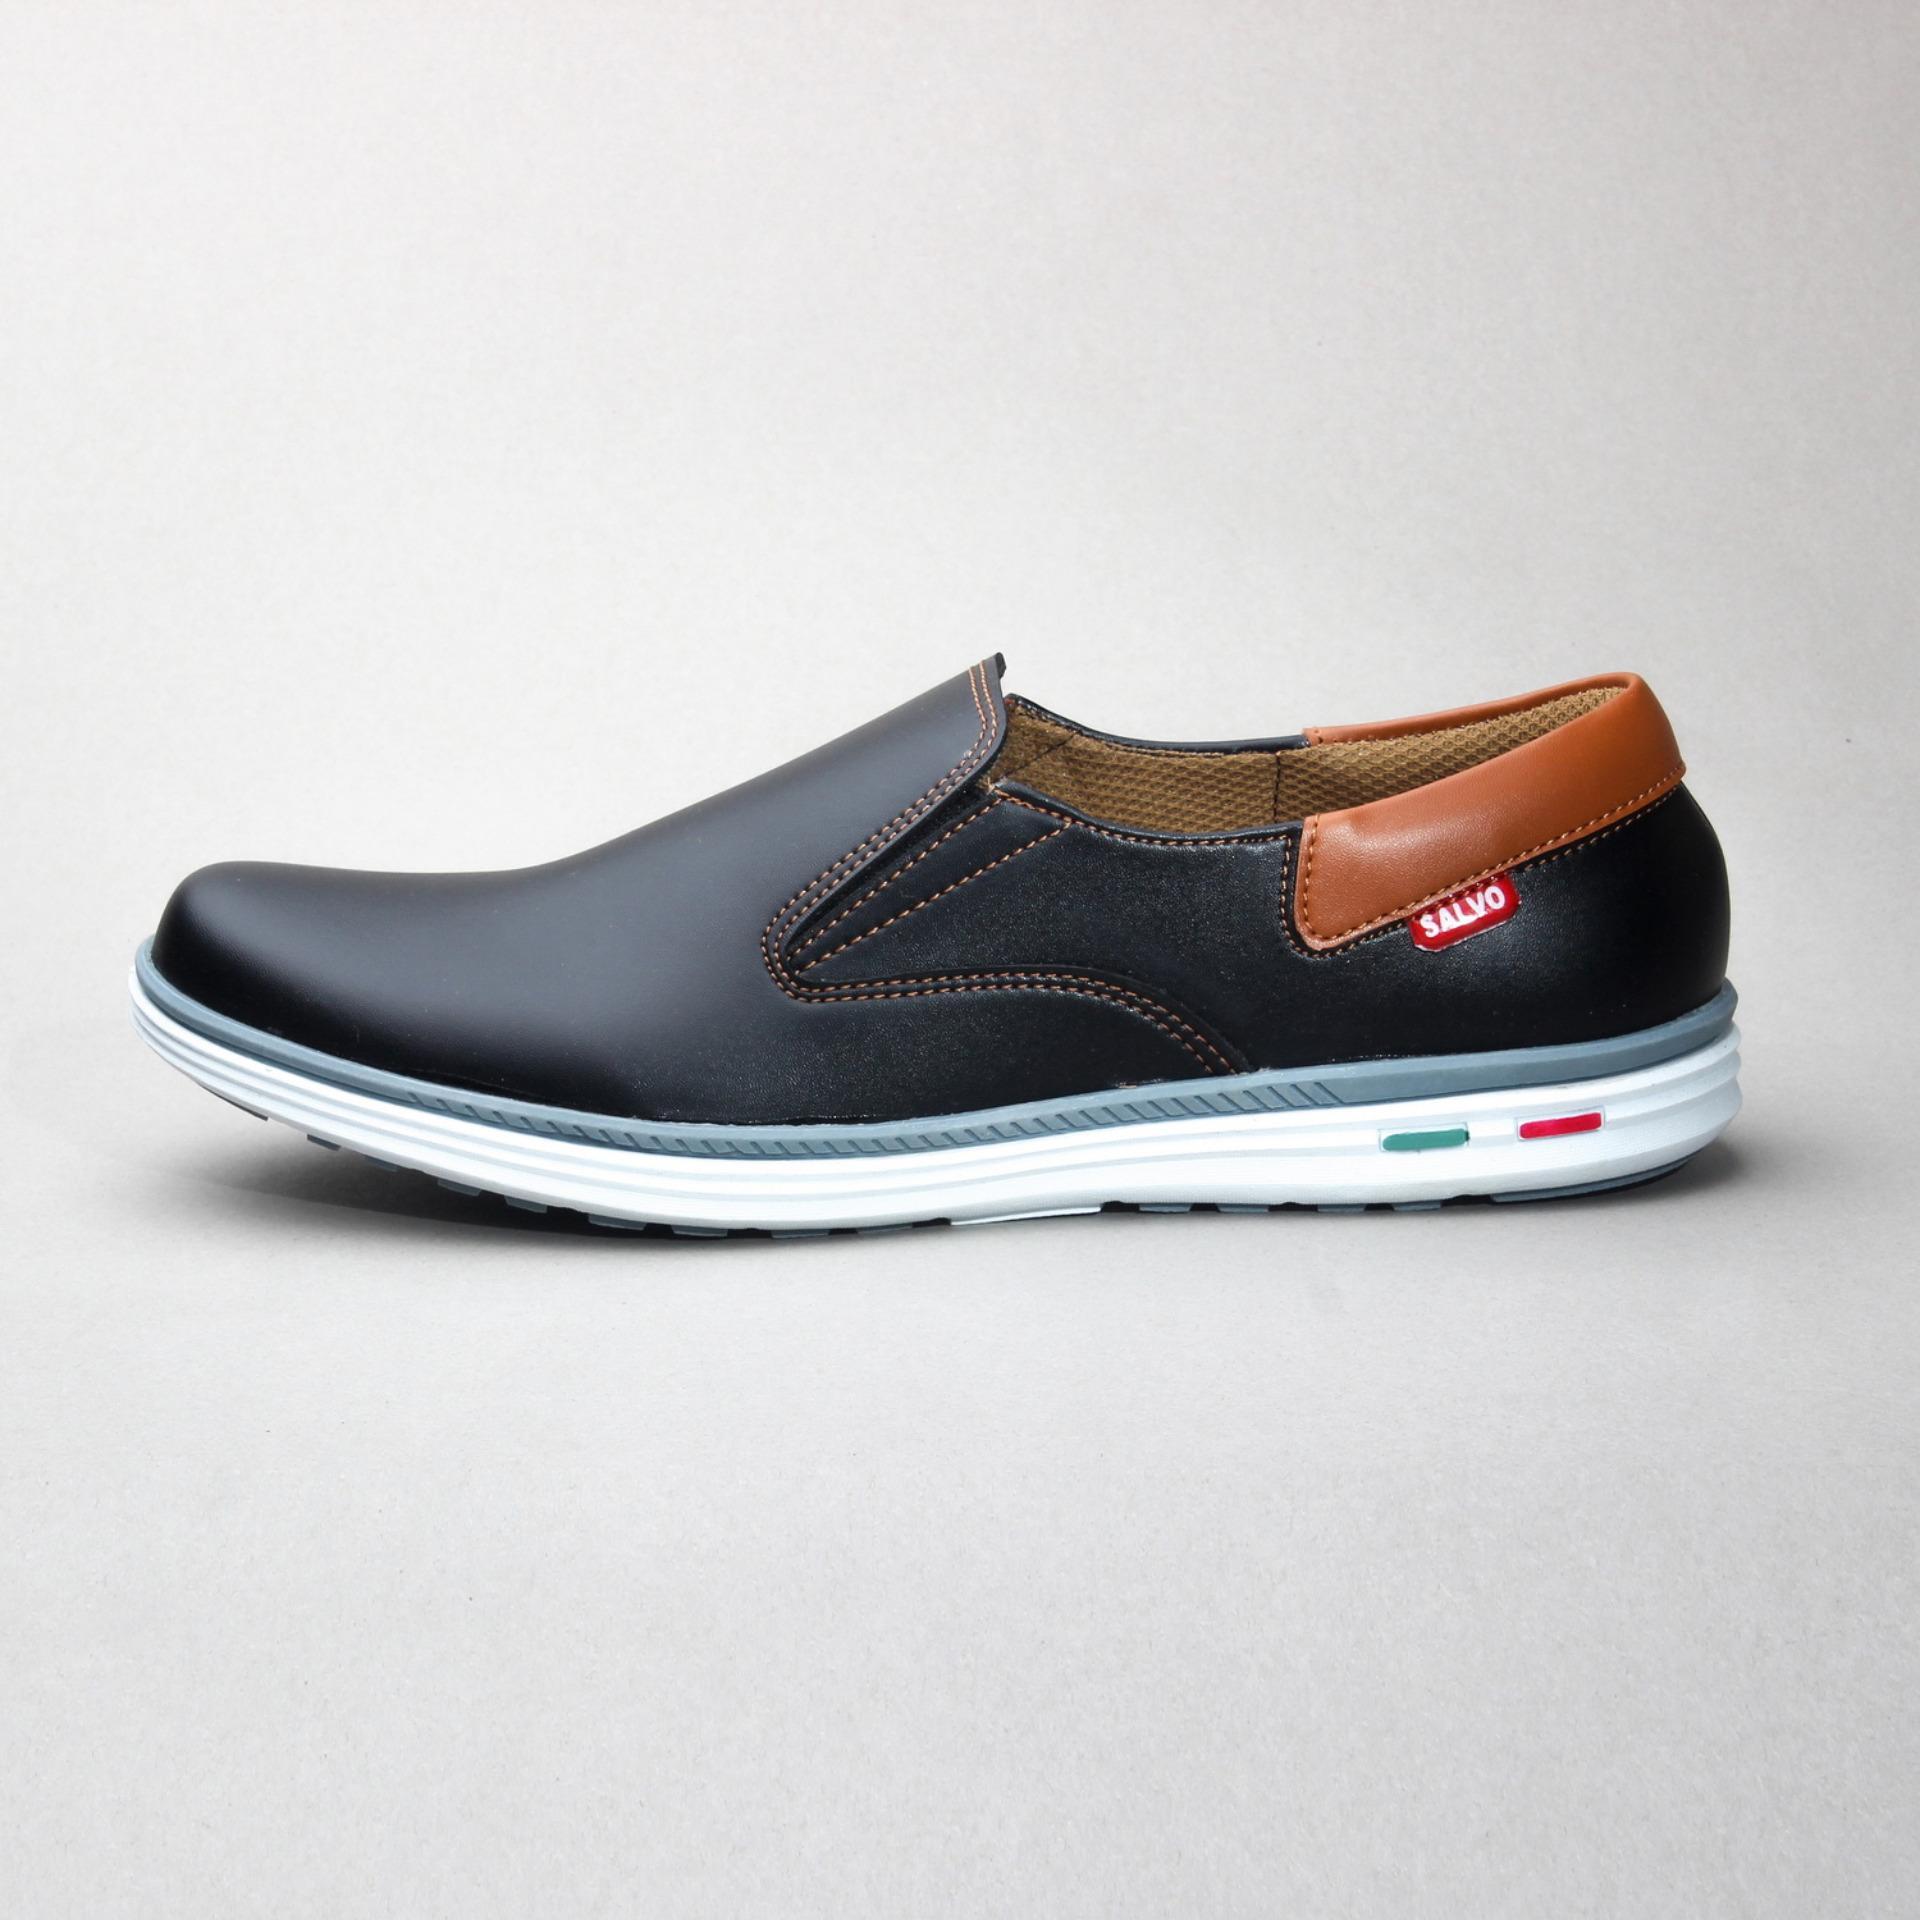 Fitur Salvo Sepatu Kets Sneakers Dan Kasual Pria Kanvas Sneaker